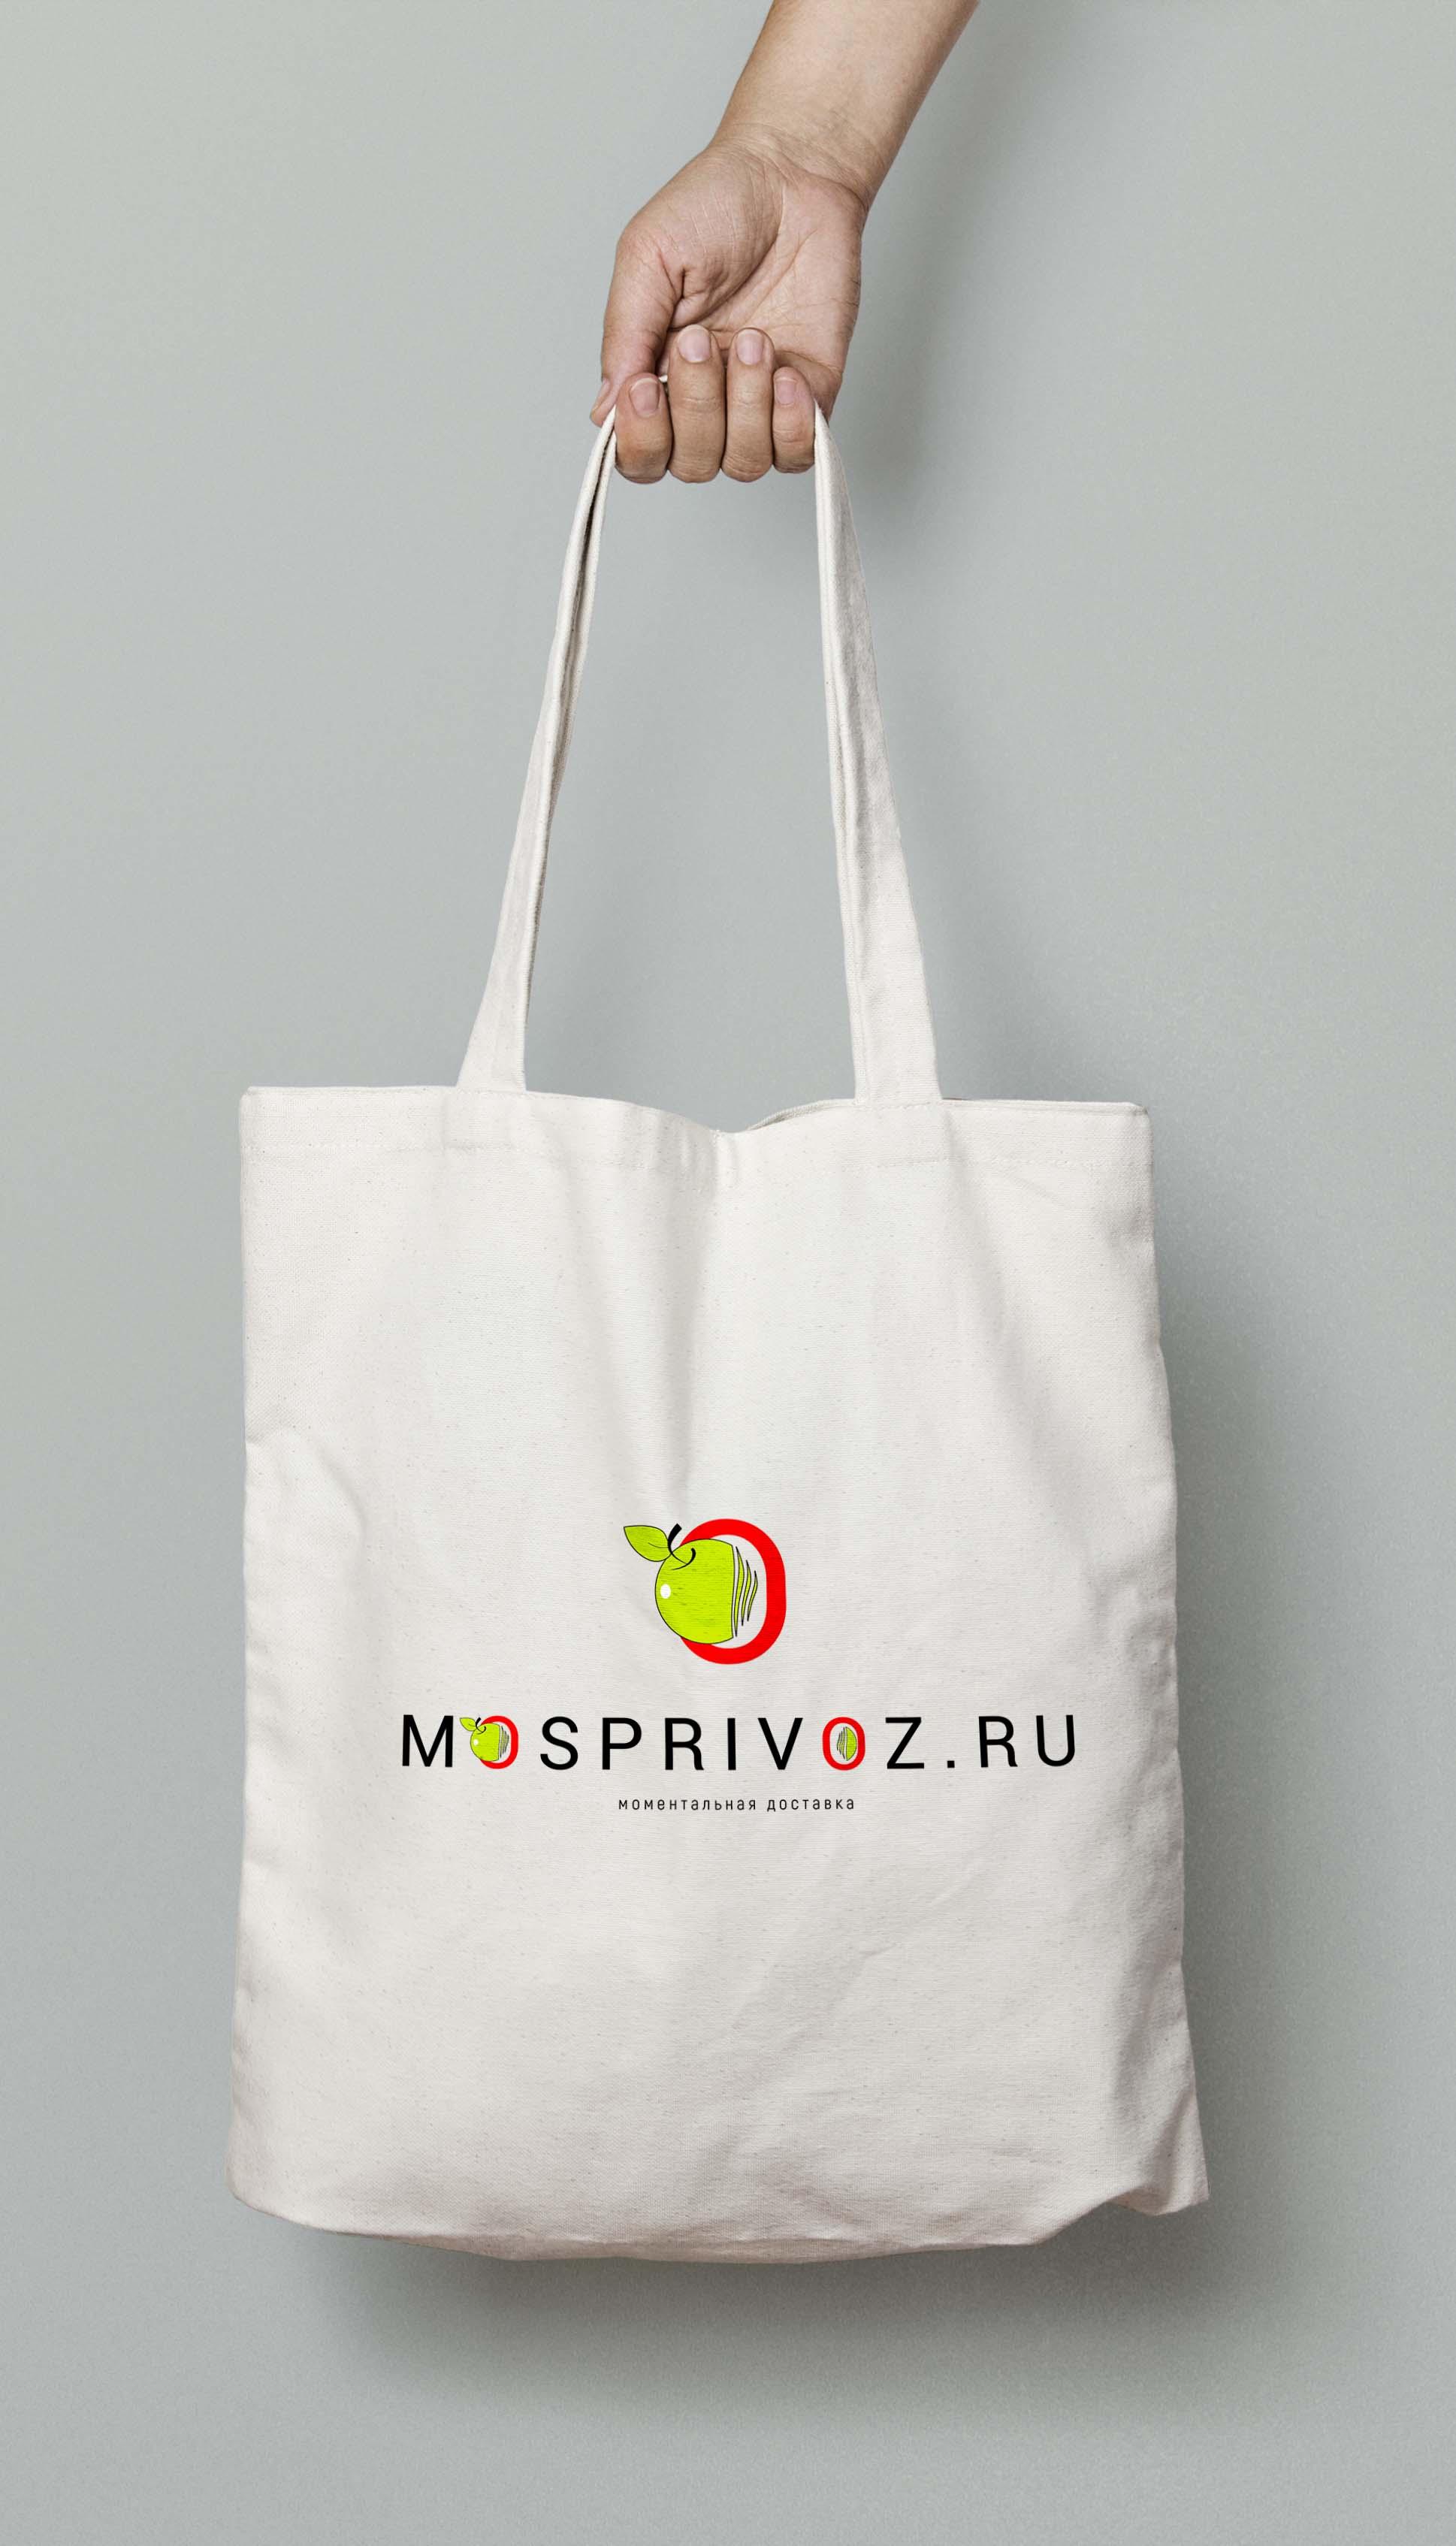 Логотип. Интернет - магазин по доставке продуктов питания. фото f_6575ad88ed3dfe36.jpg